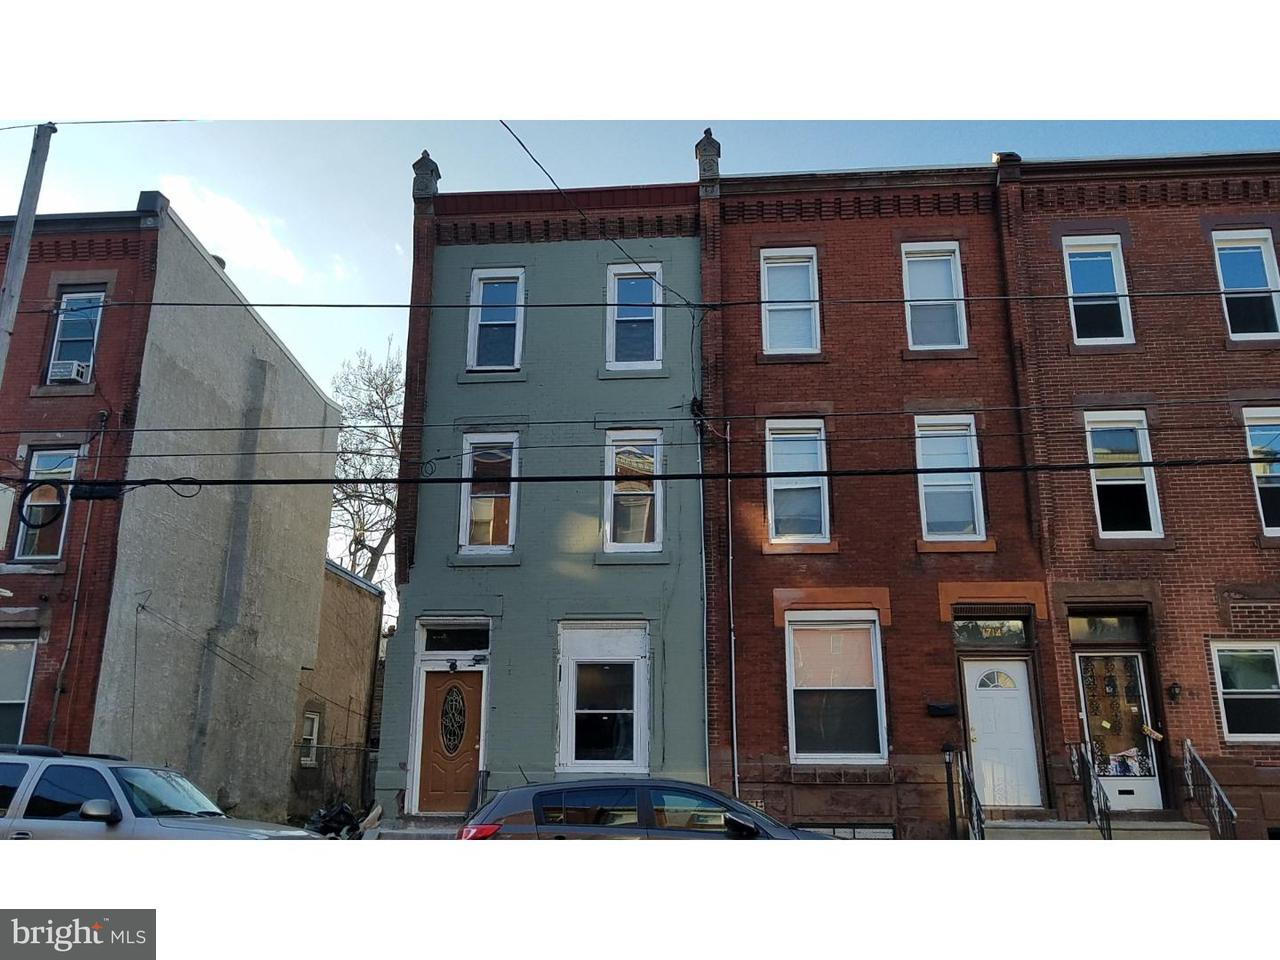 Townhouse for Sale at 1712 N 25TH Street Philadelphia, Pennsylvania 19121 United States